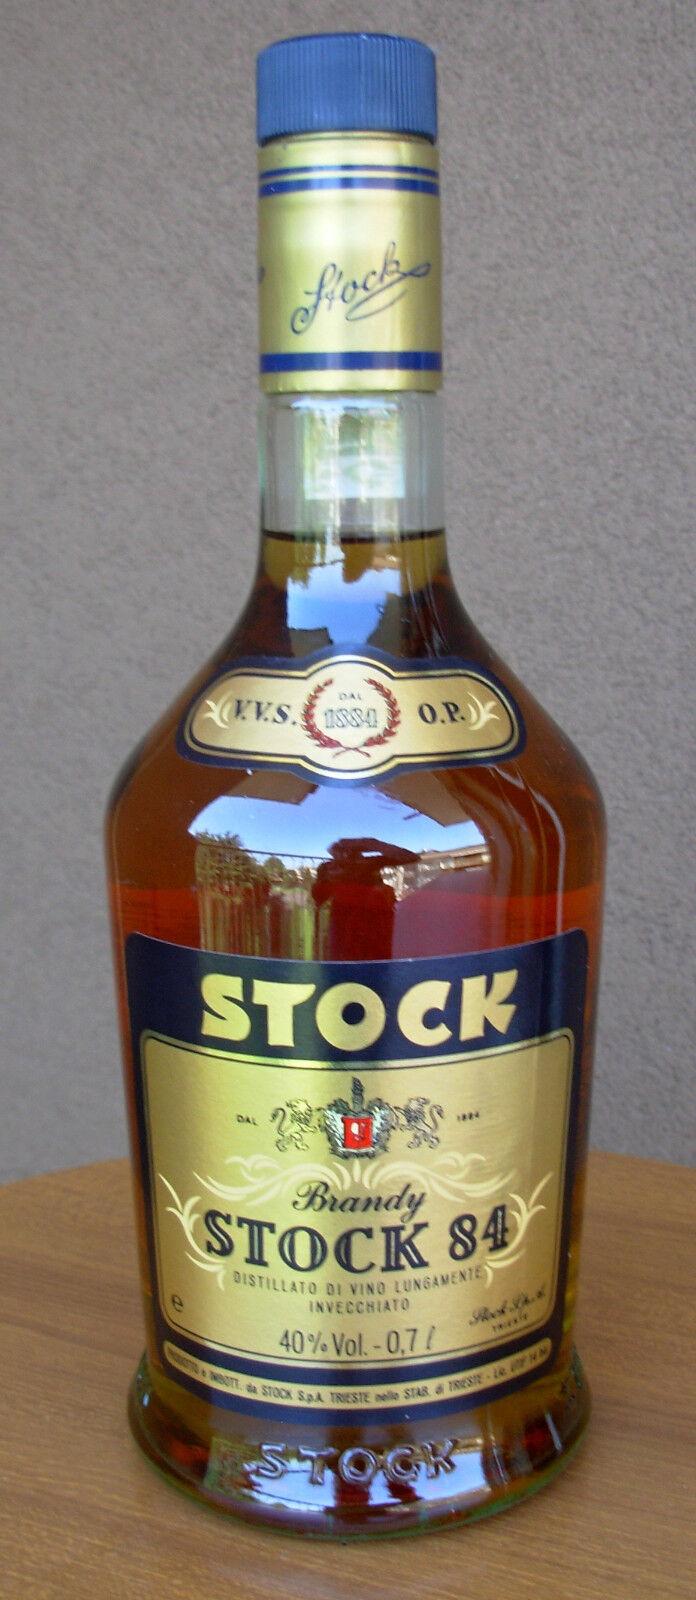 Brandy Stock 84 VVSOP  0,7 Litri 40% Vol  Stock Trieste  Vintage